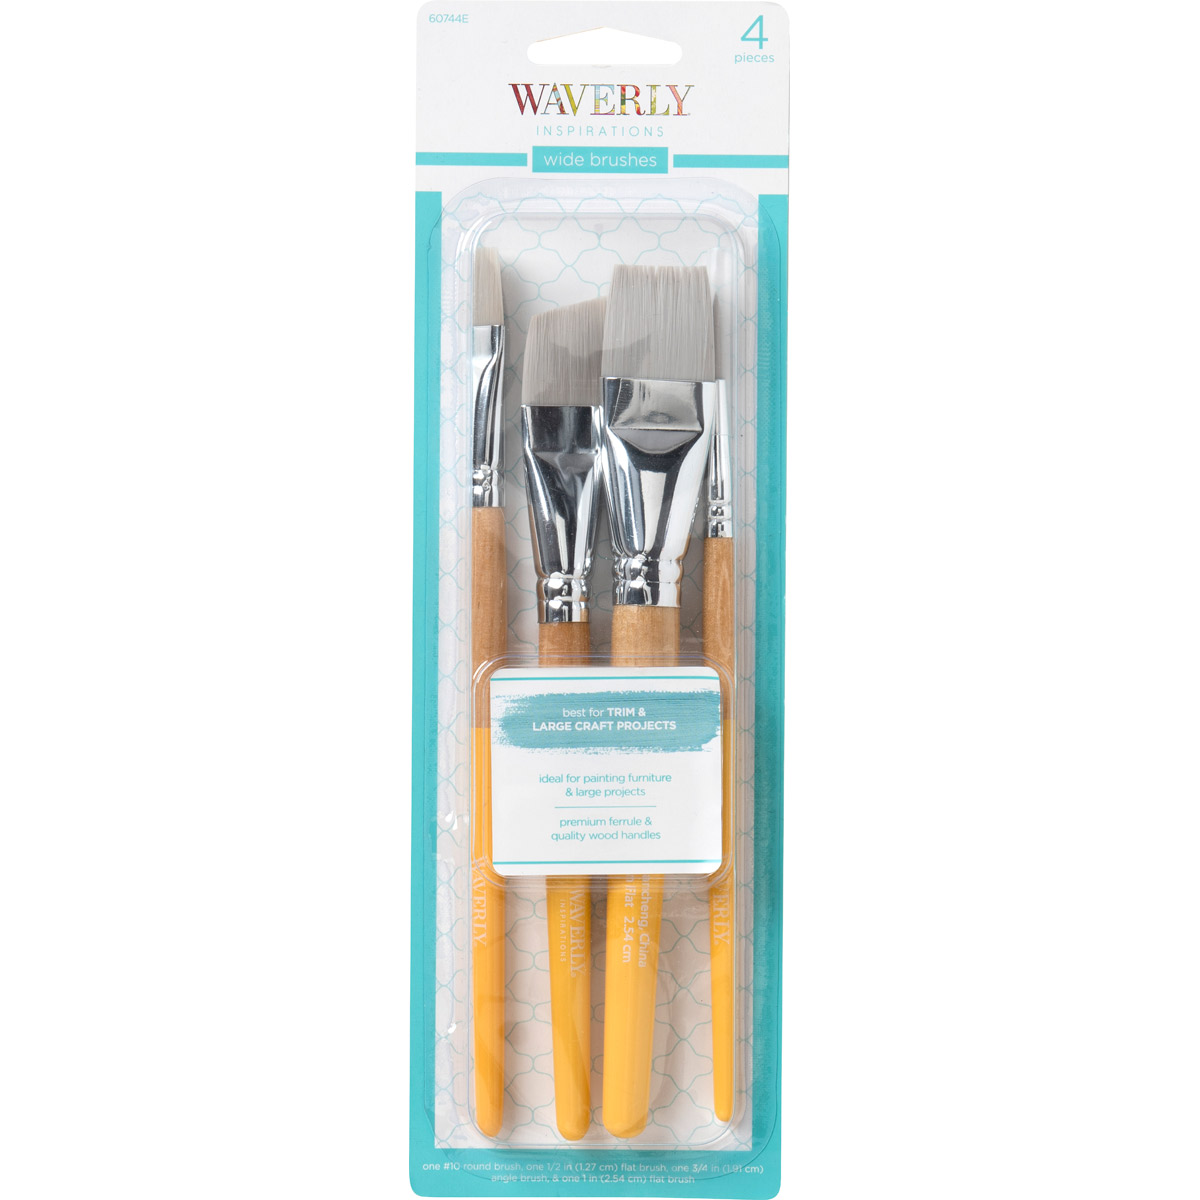 Waverly ® Inspirations Brushes - Wide Set, 4 pc.